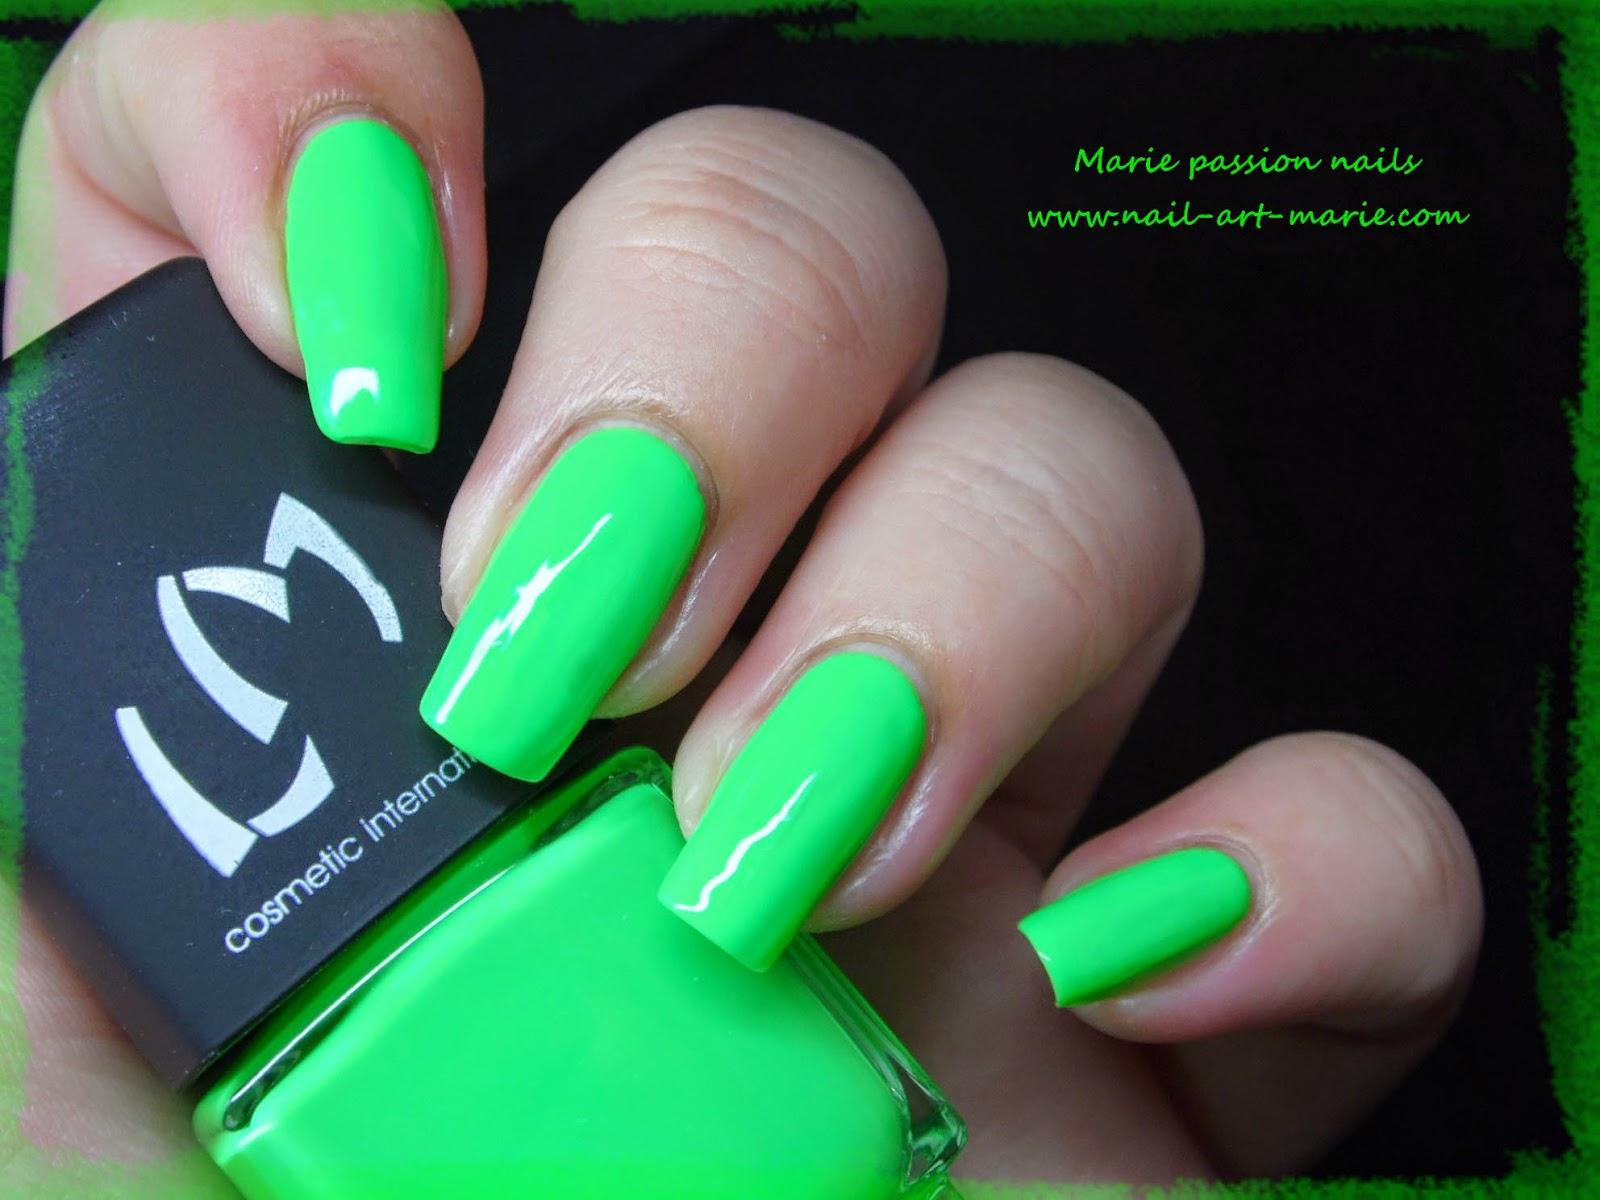 LM Cosmetic Duchamp8